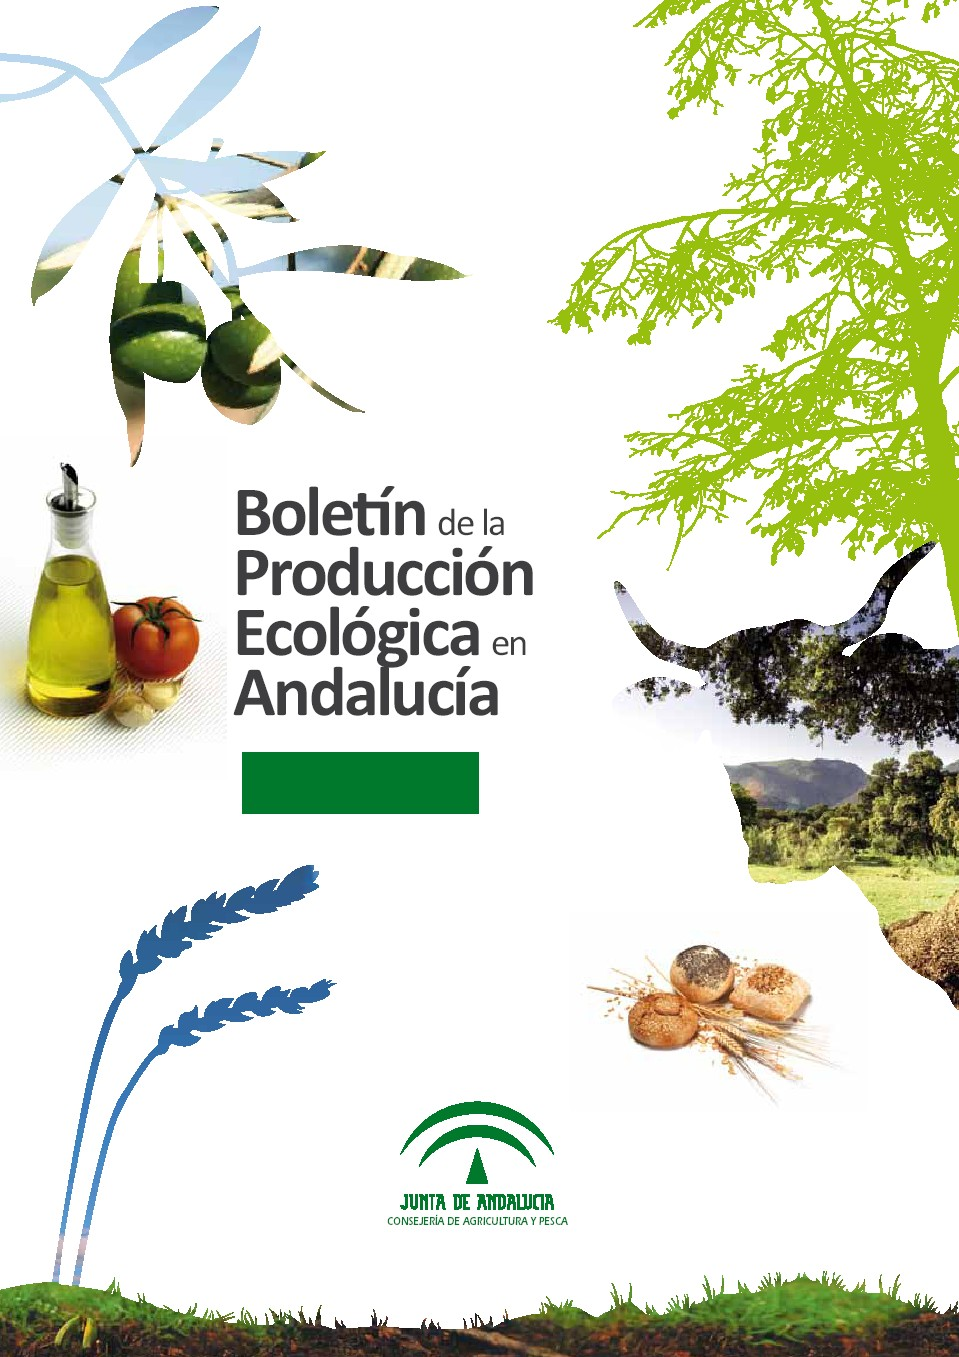 boletin_produccion_eco